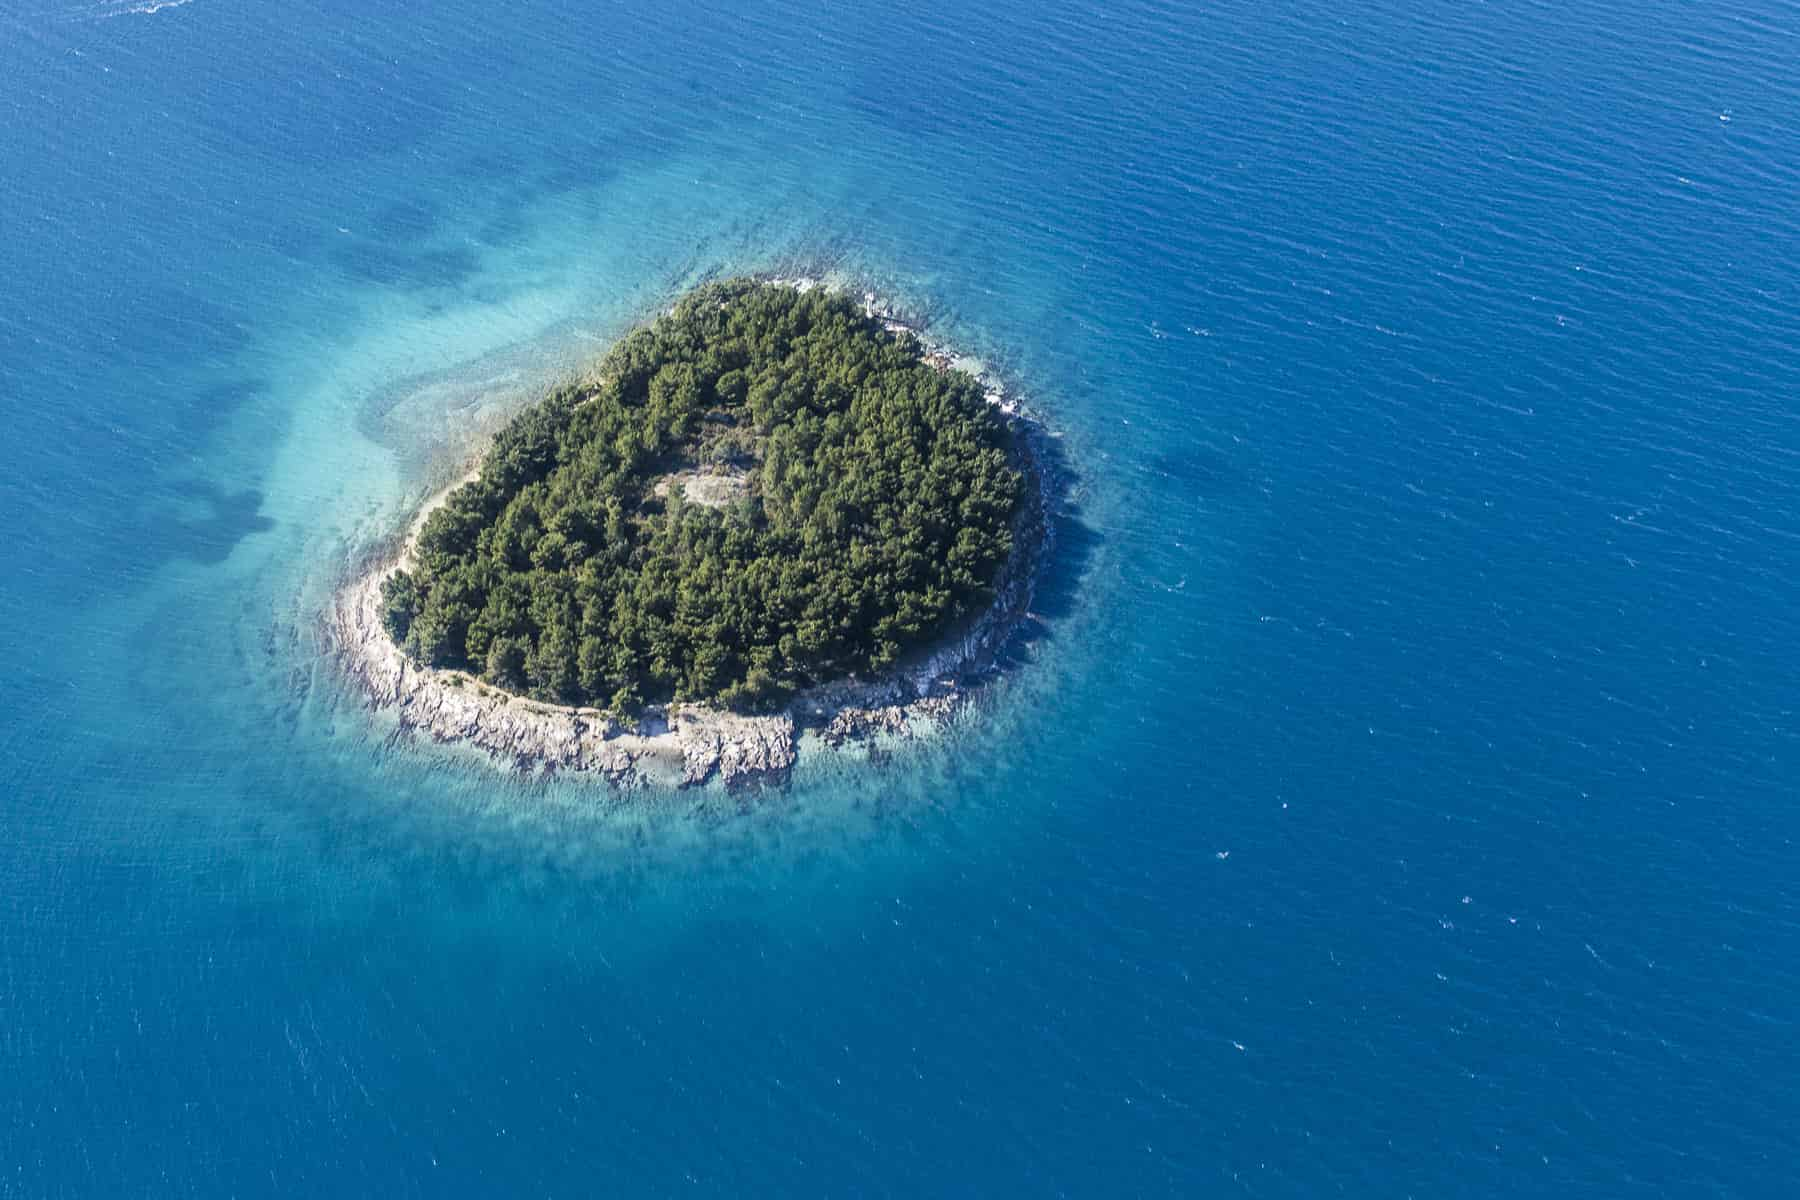 Island and clear sea